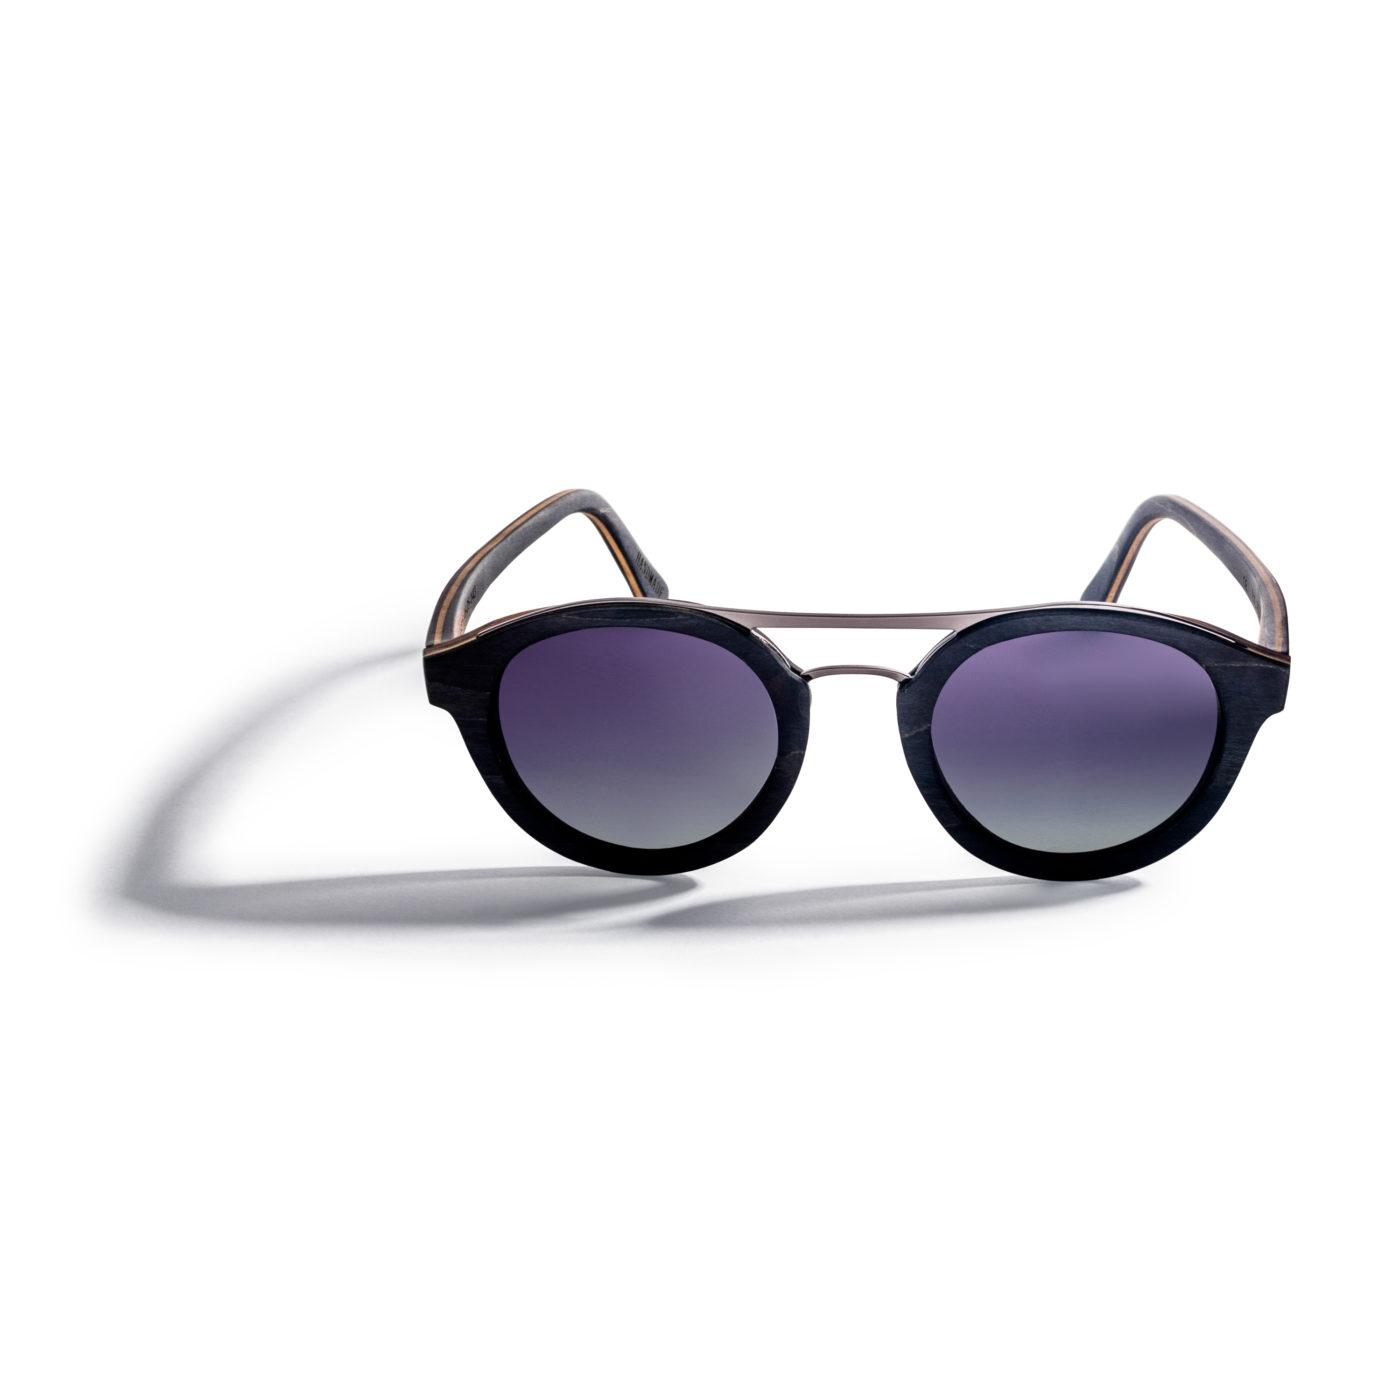 Kraywoods men vintage aviator walnut wood sunglasses polarized lenses